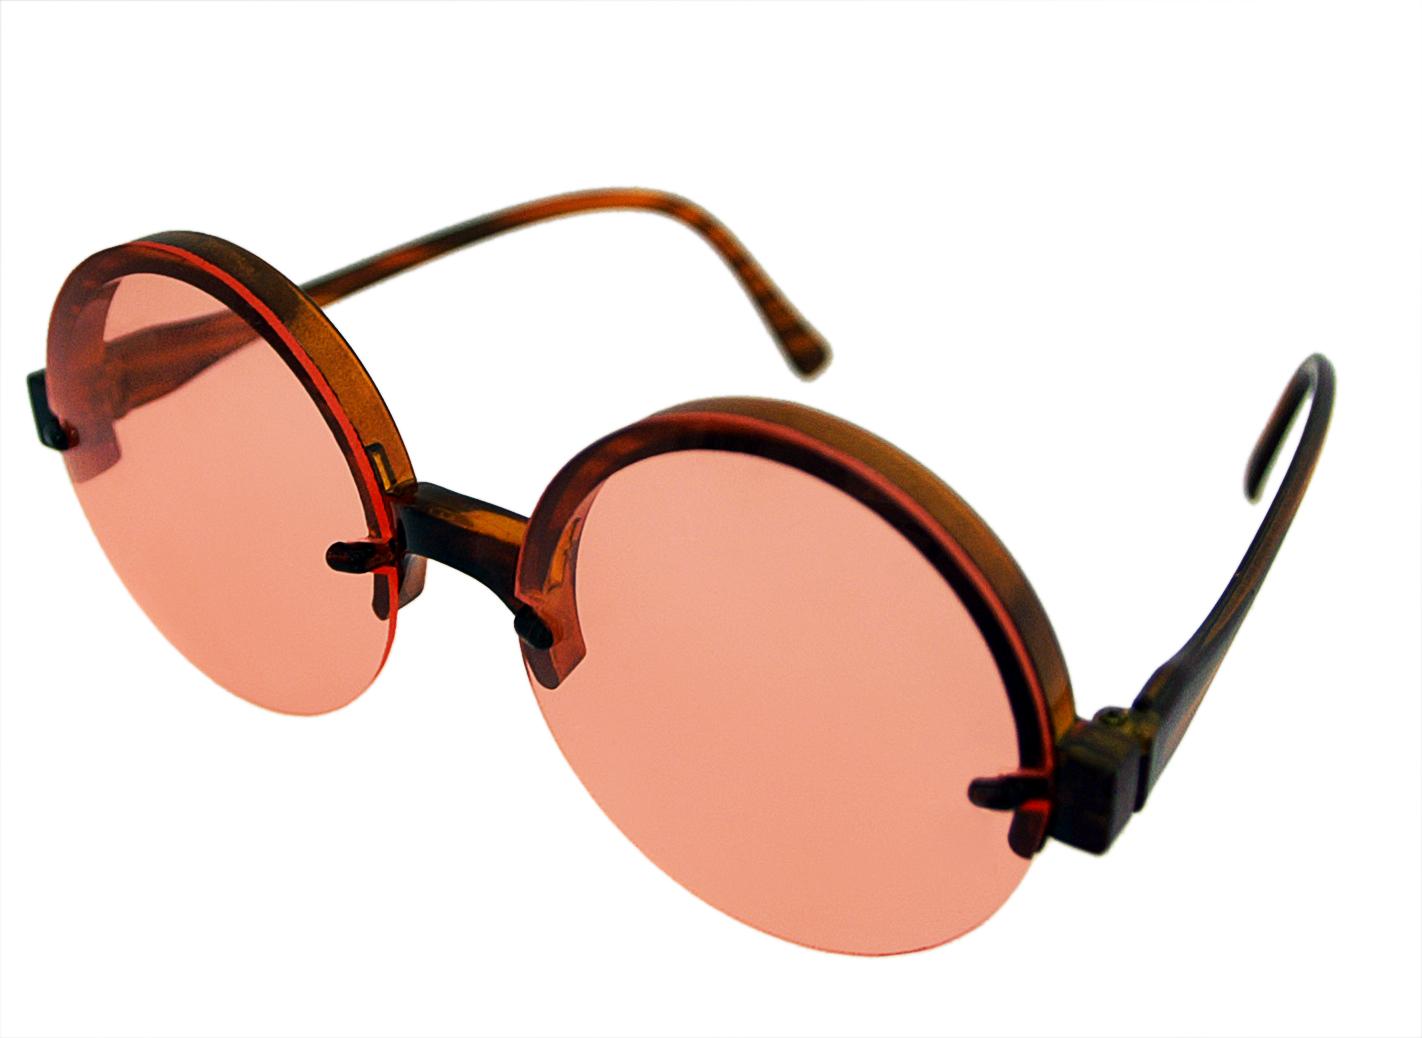 70's Style Aviator Sunglasses | Louisiana Bucket Brigade